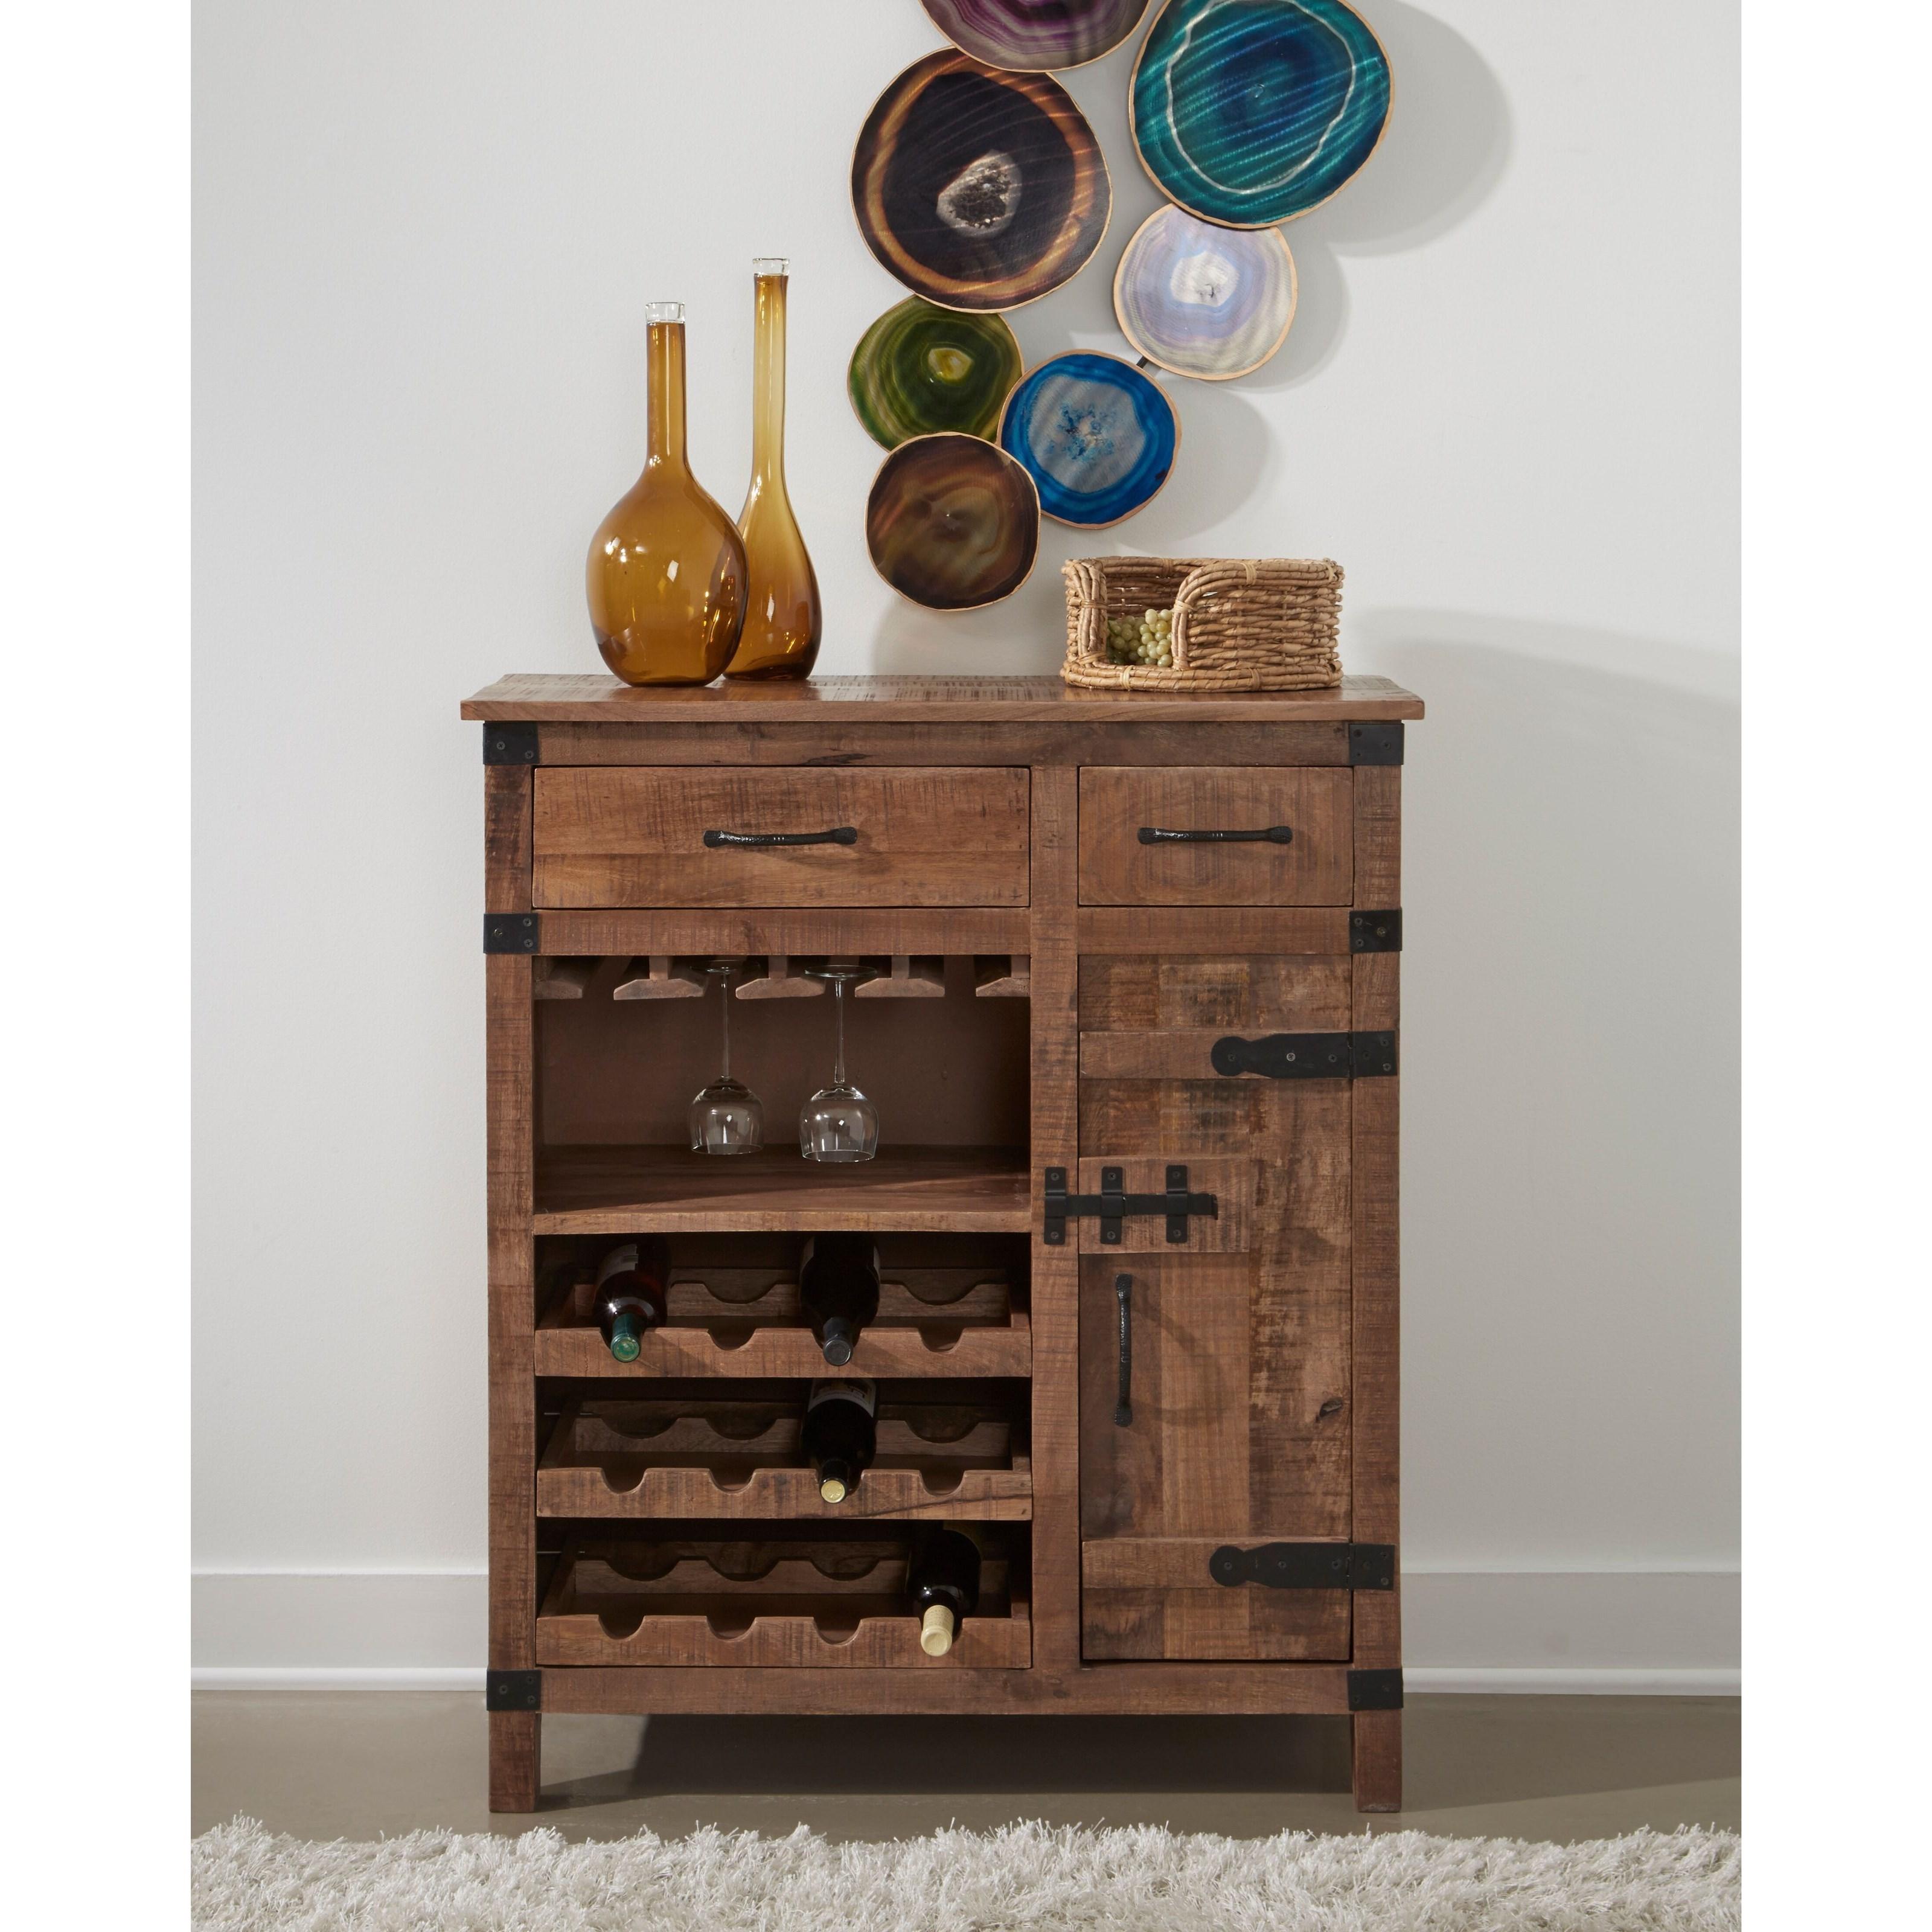 44620 One Door Two Drawer Wine Cabinet $525